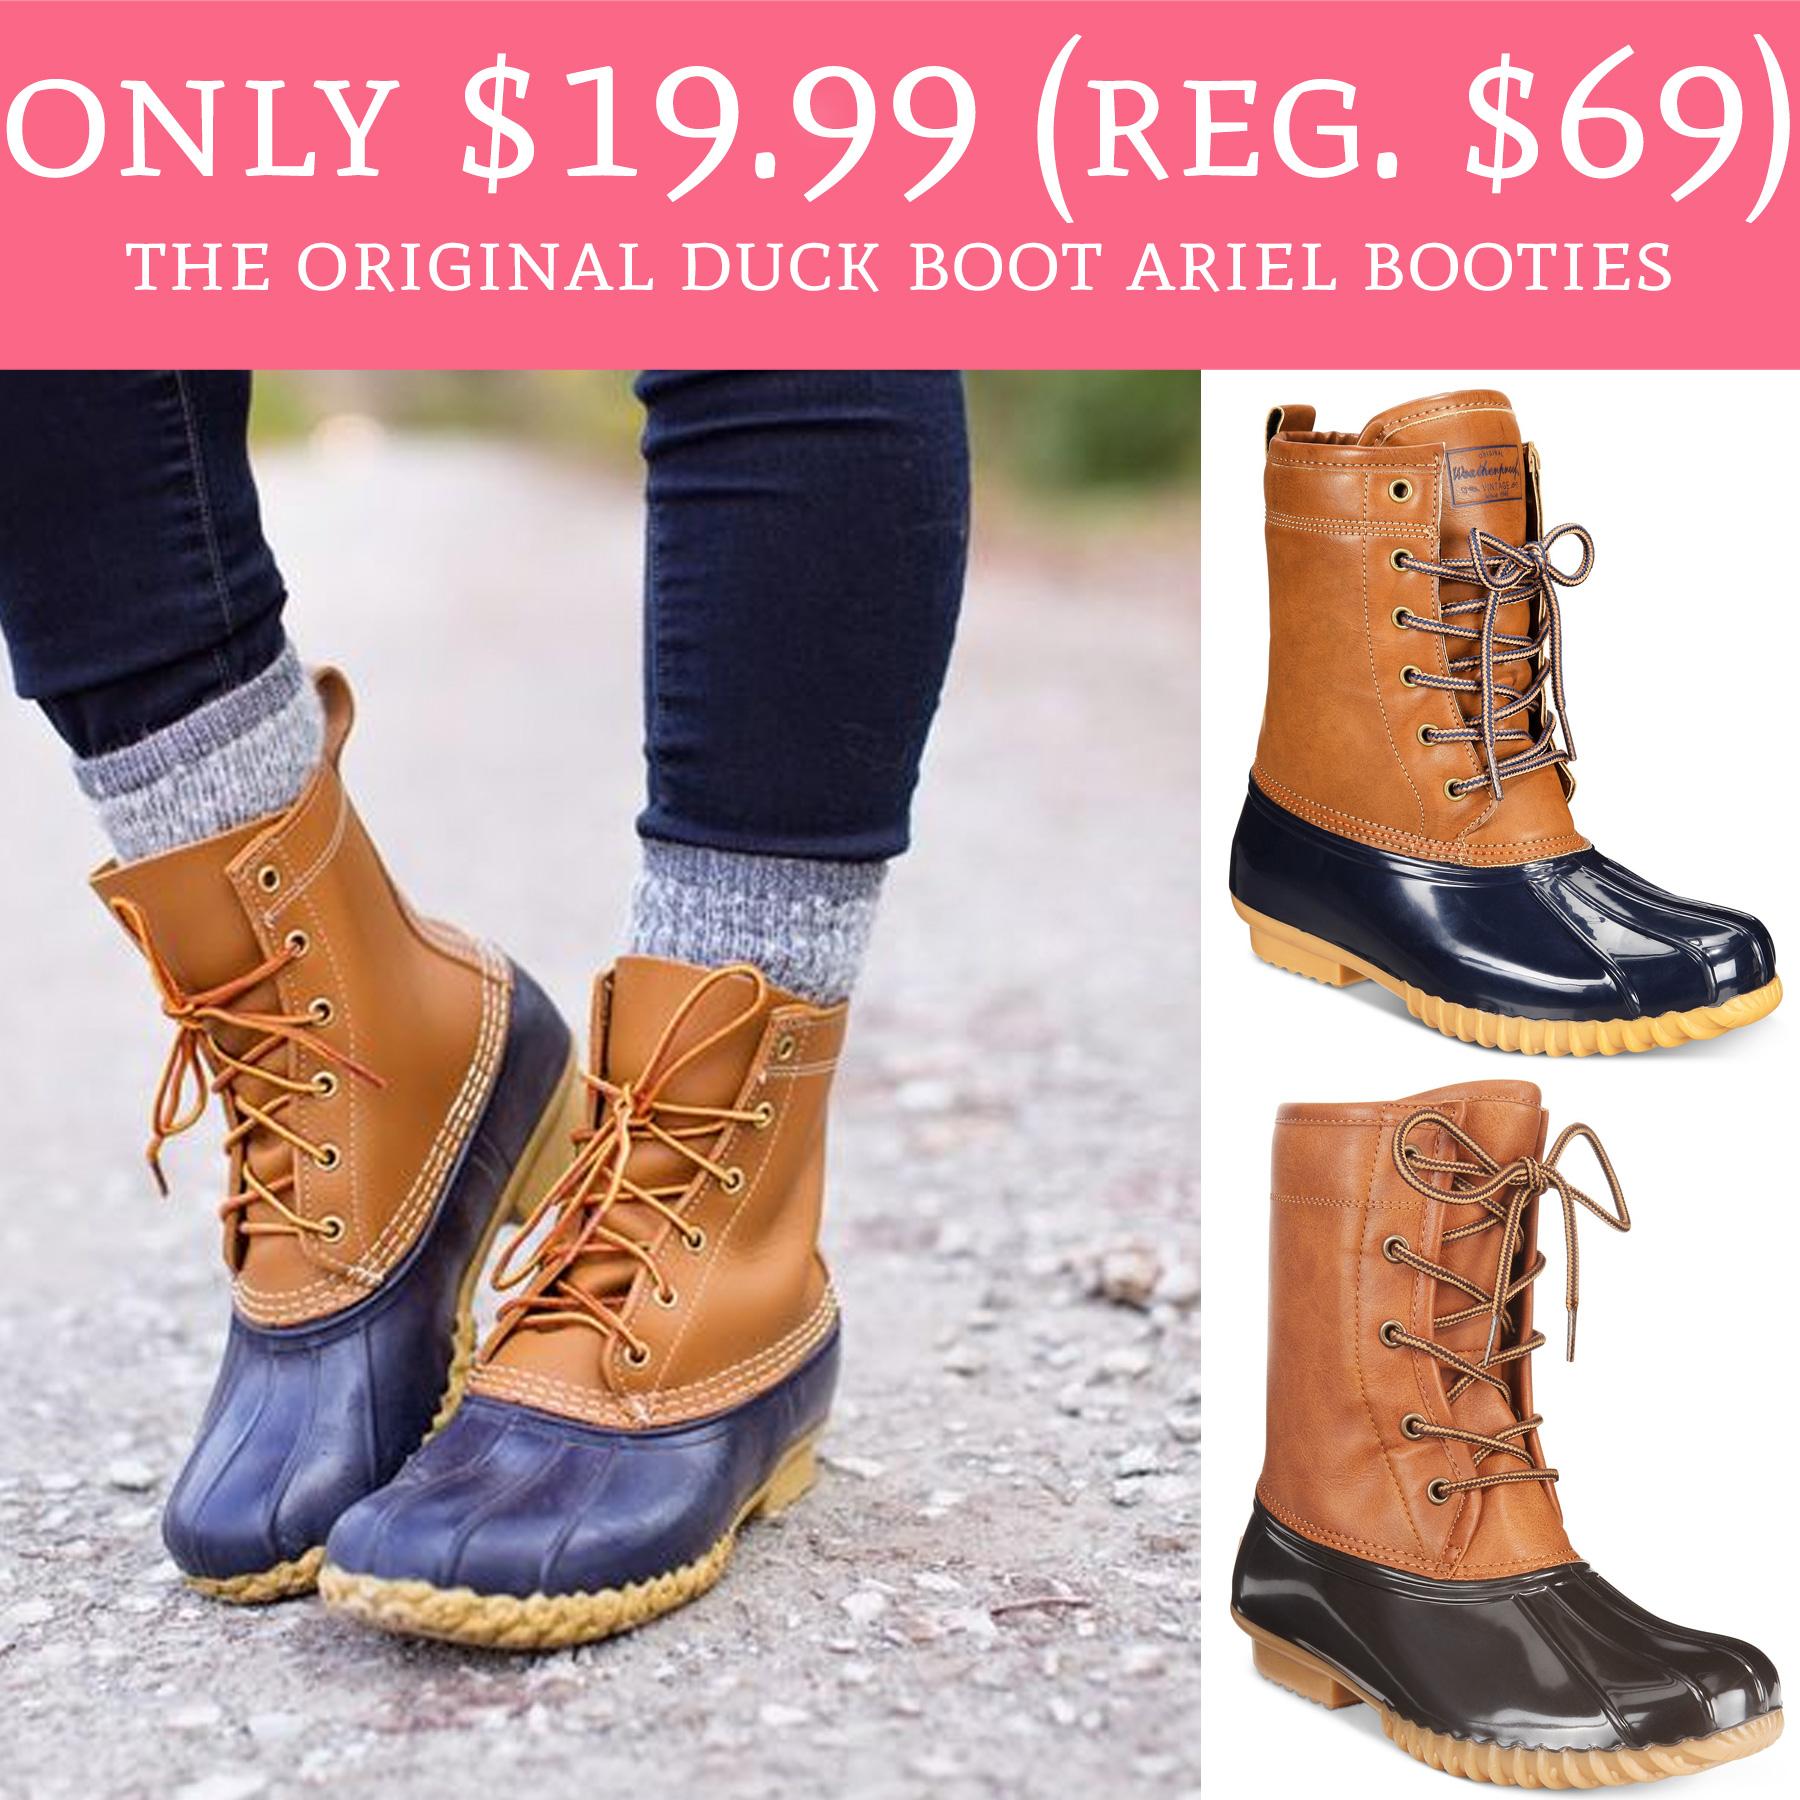 the original duck boot